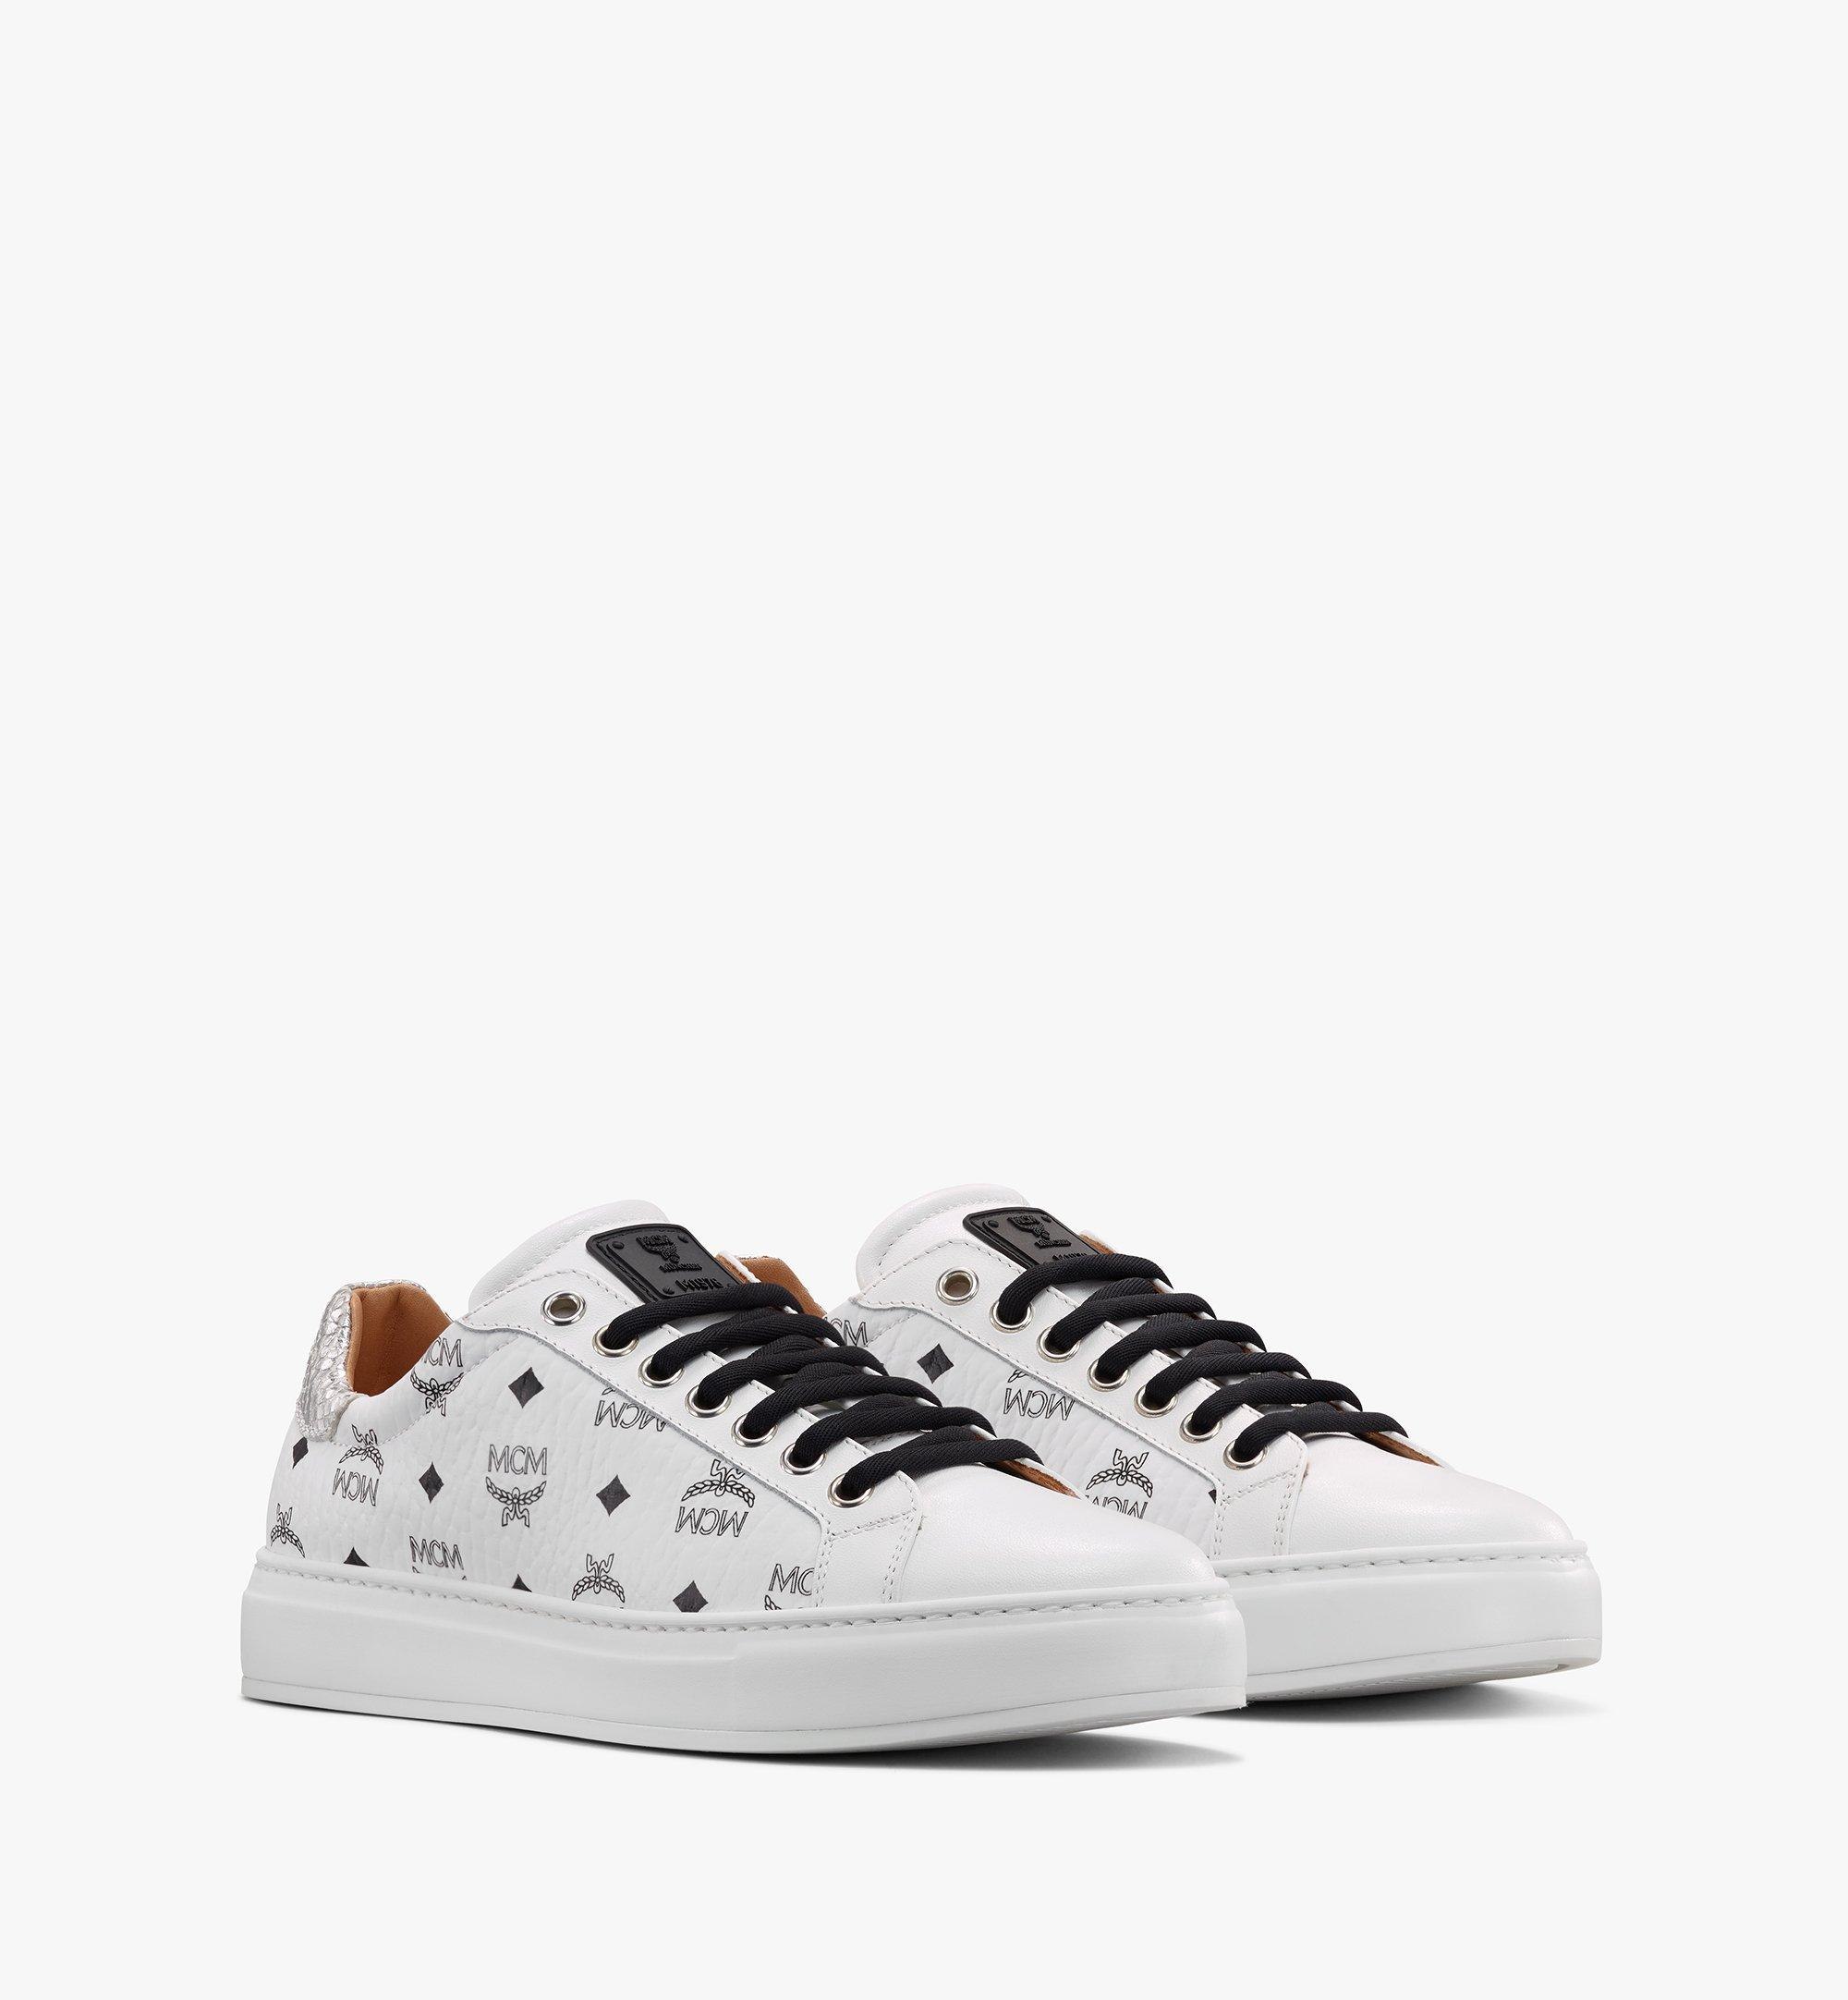 MCM Men's Low-Top Sneakers in Visetos White MEXASMM10WT044 Alternate View 1